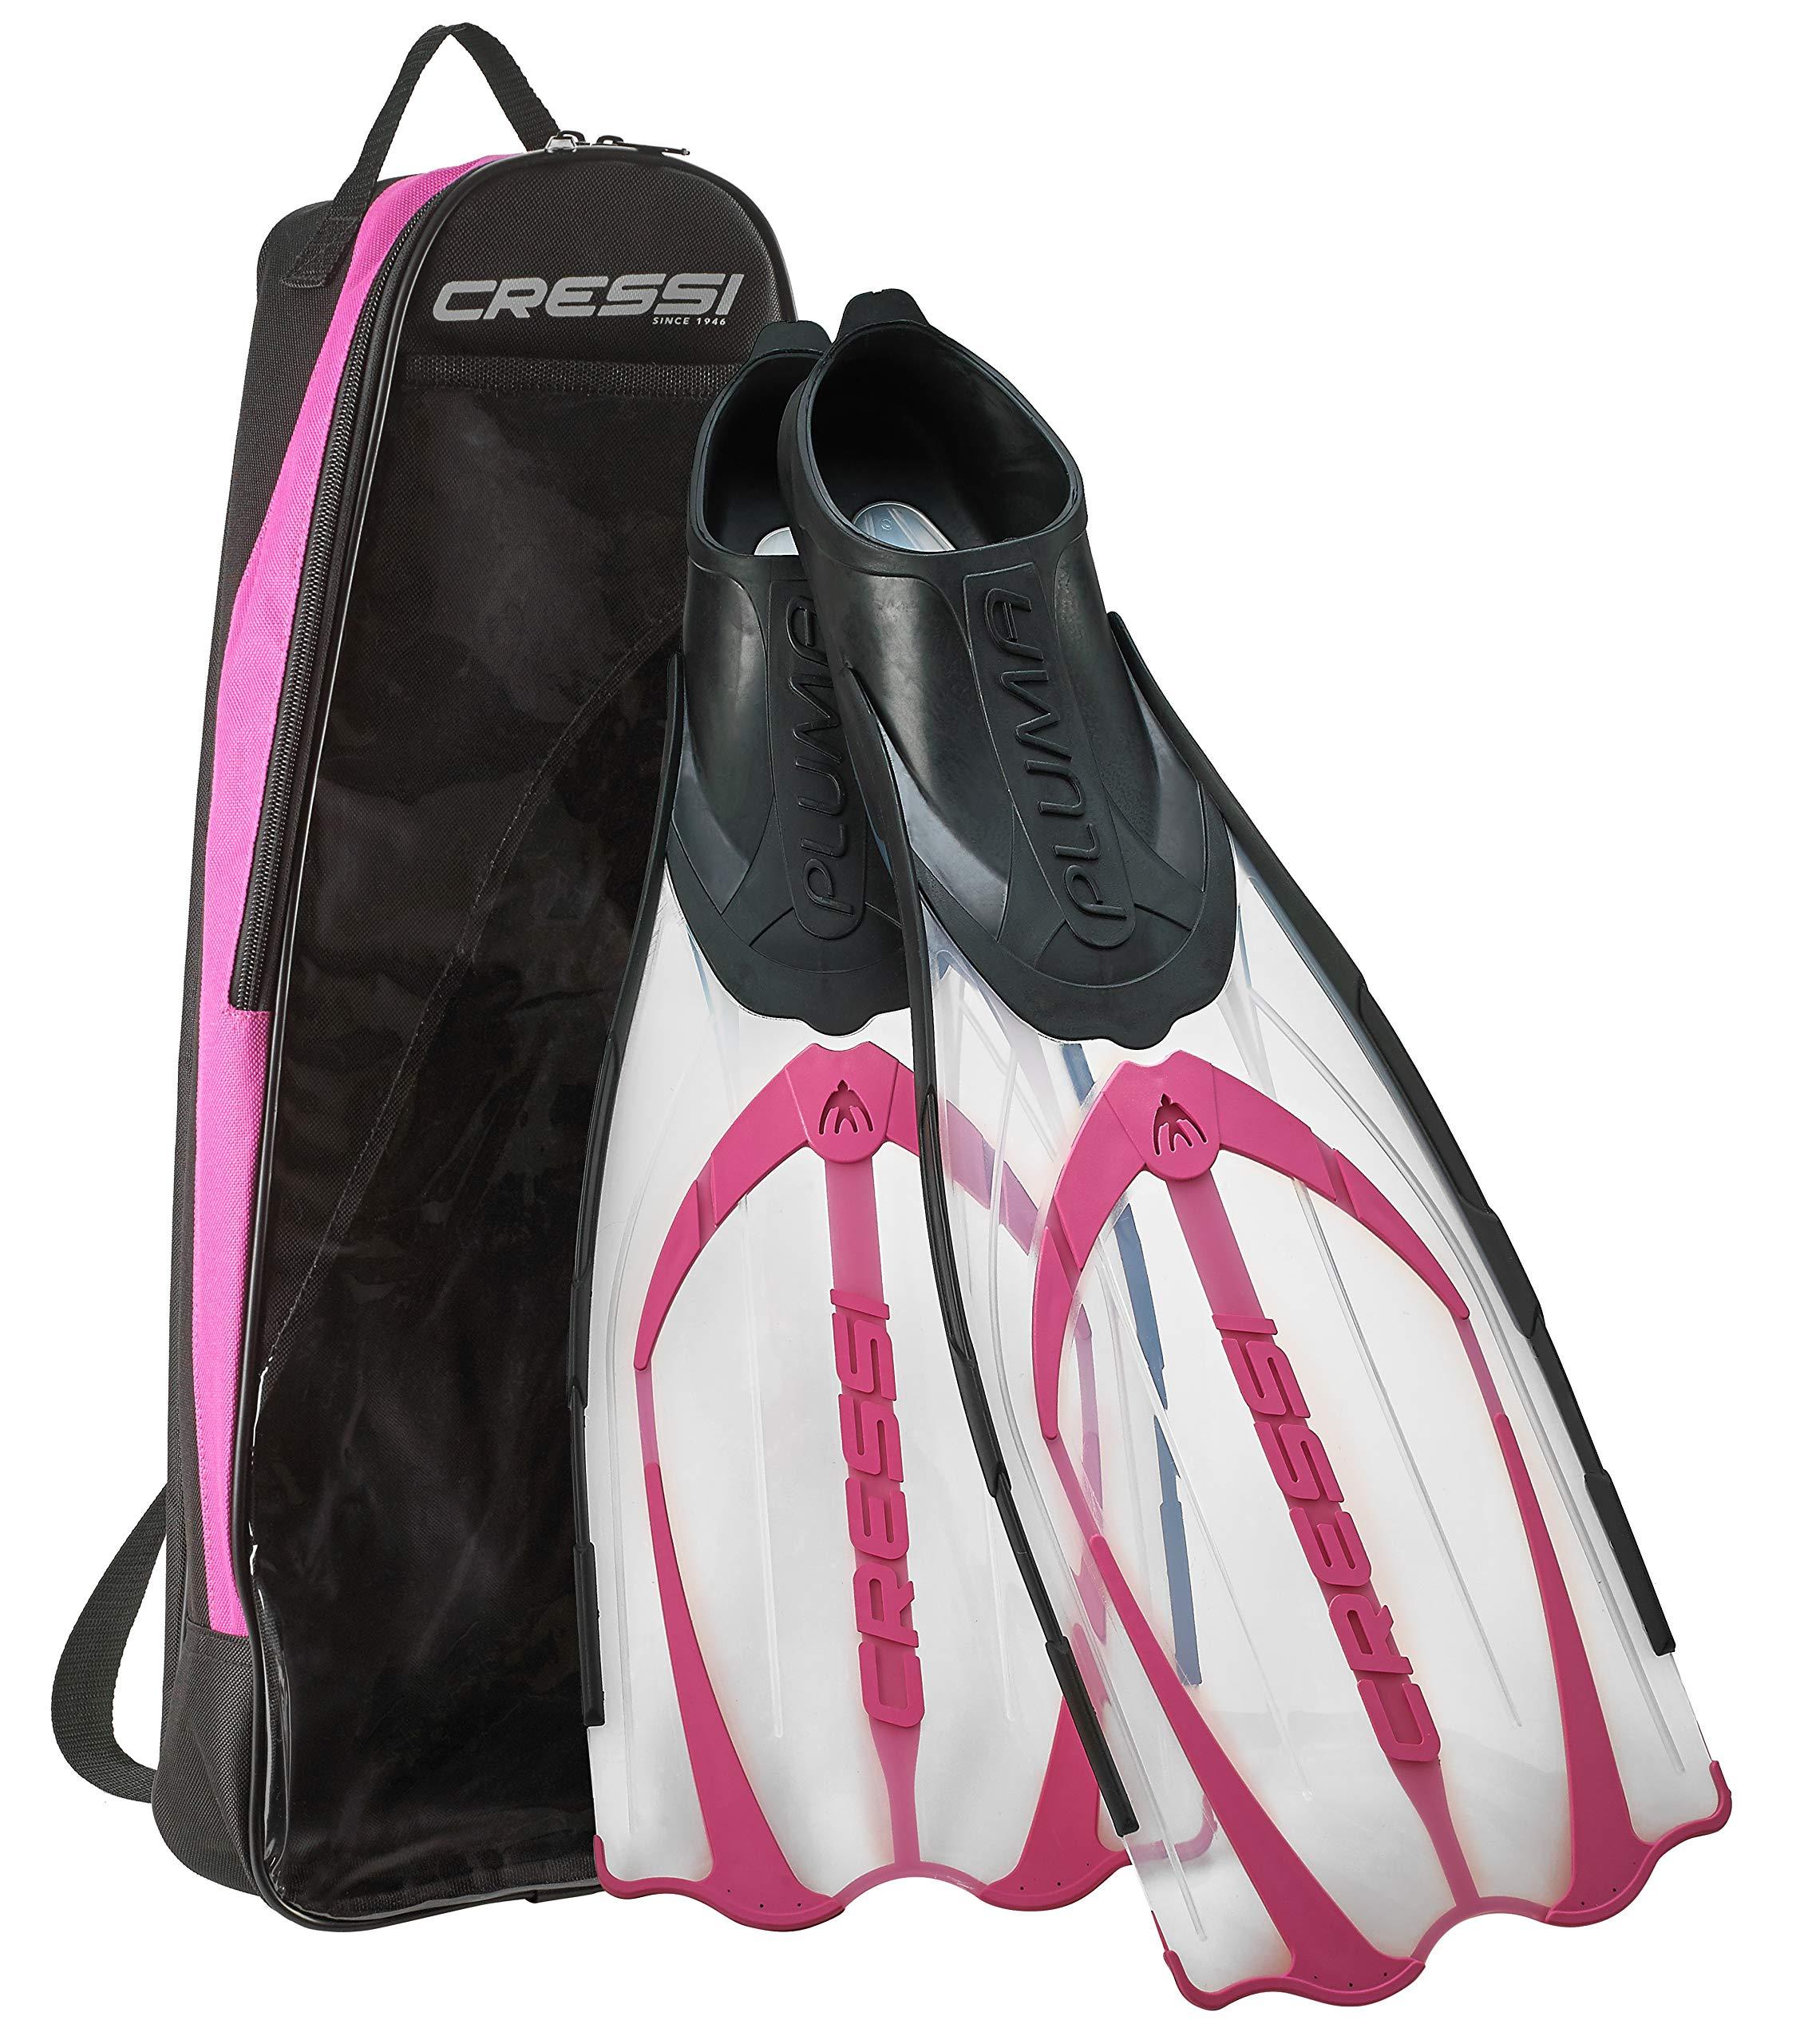 Cressi Pluma Italian Made Full Foot Snorkeling Fins with Snorkel Gear Bag, Pink - US Man 5.5/6.5 | US Lady 6.5/7.5 | EU 37/38 by Cressi